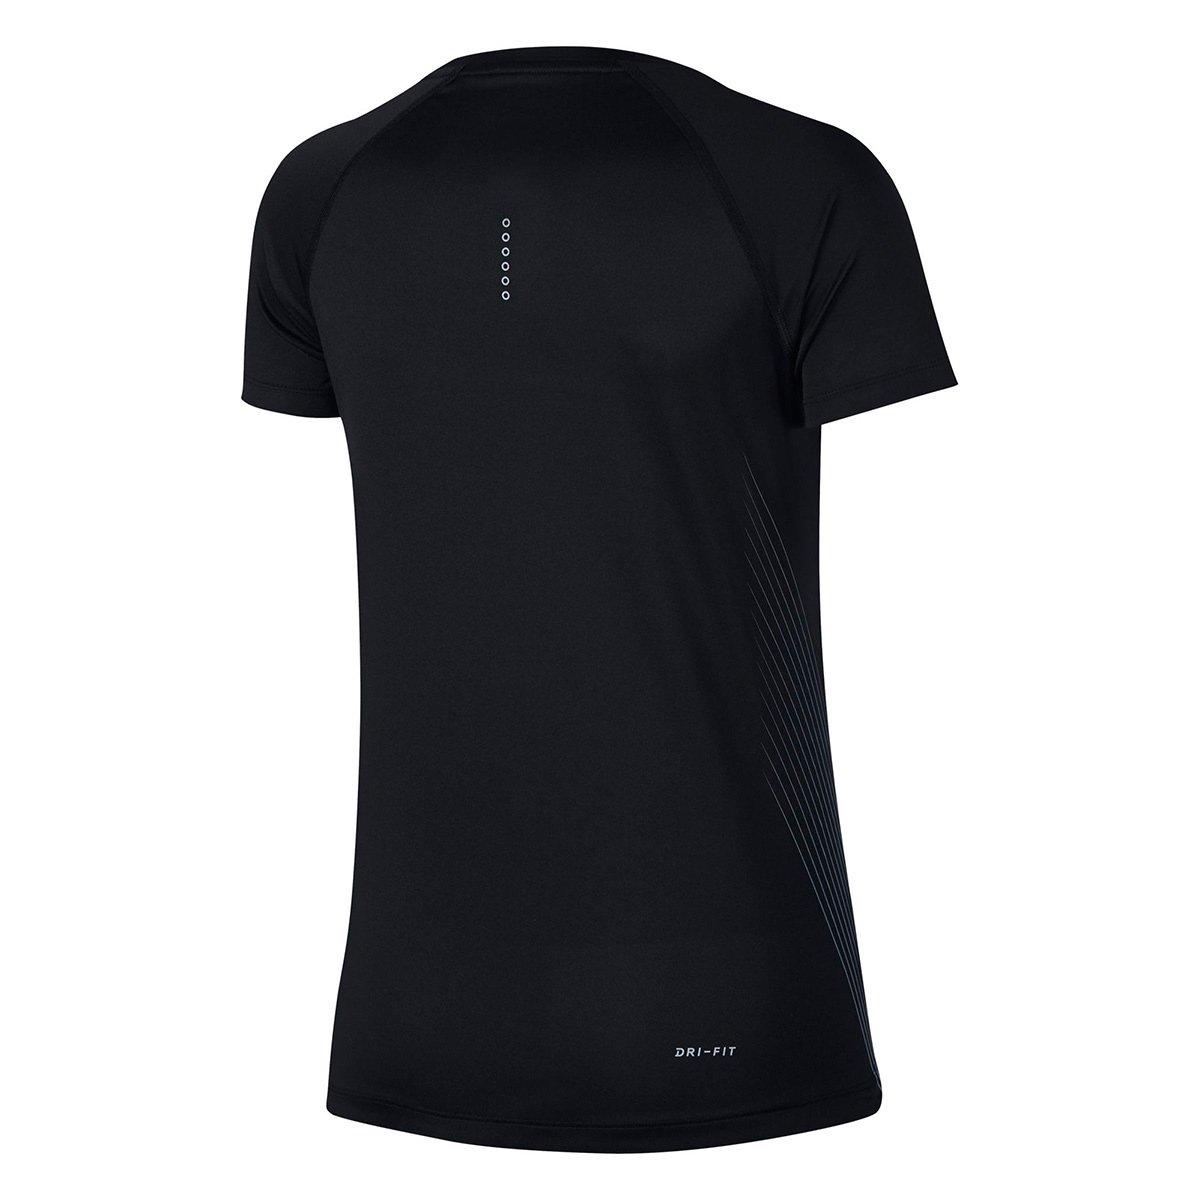 Camiseta Nike Dry Miler Flsh Gx Feminina - Compre Agora  953bc0af48376